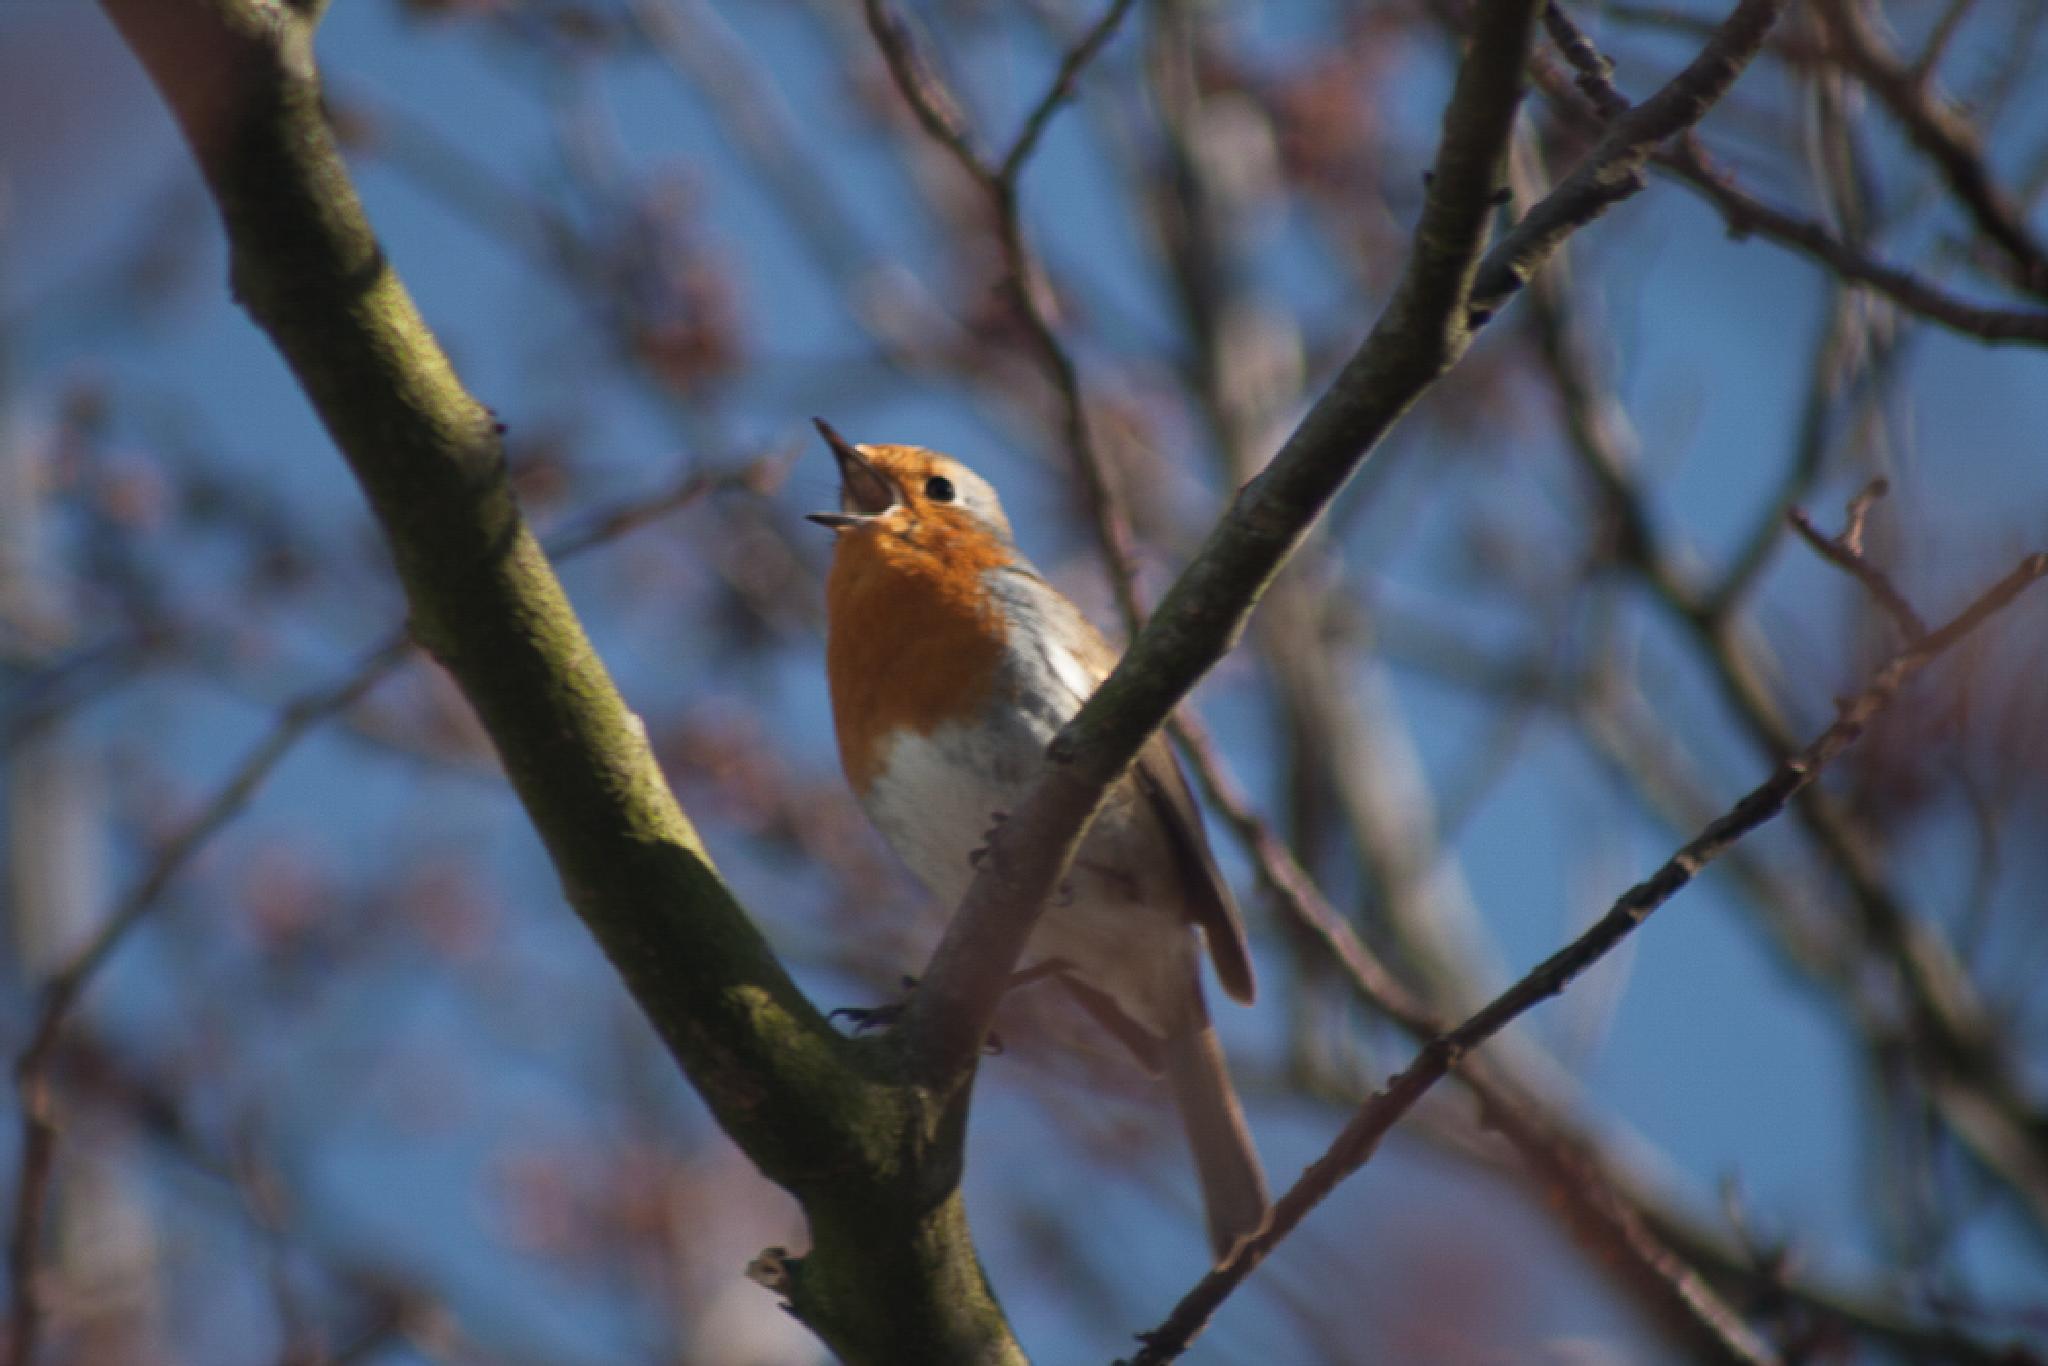 Robin singing in the sun. by bob.cunningham.56884